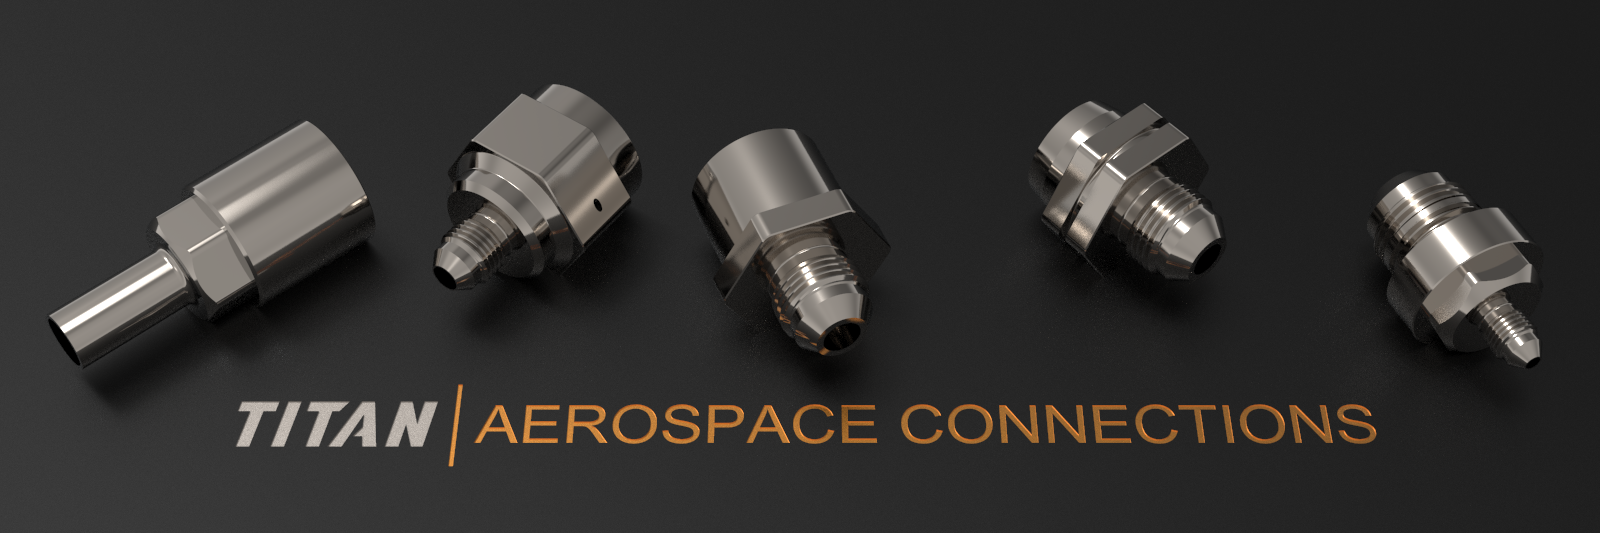 TITAN Aerospace Connections Image